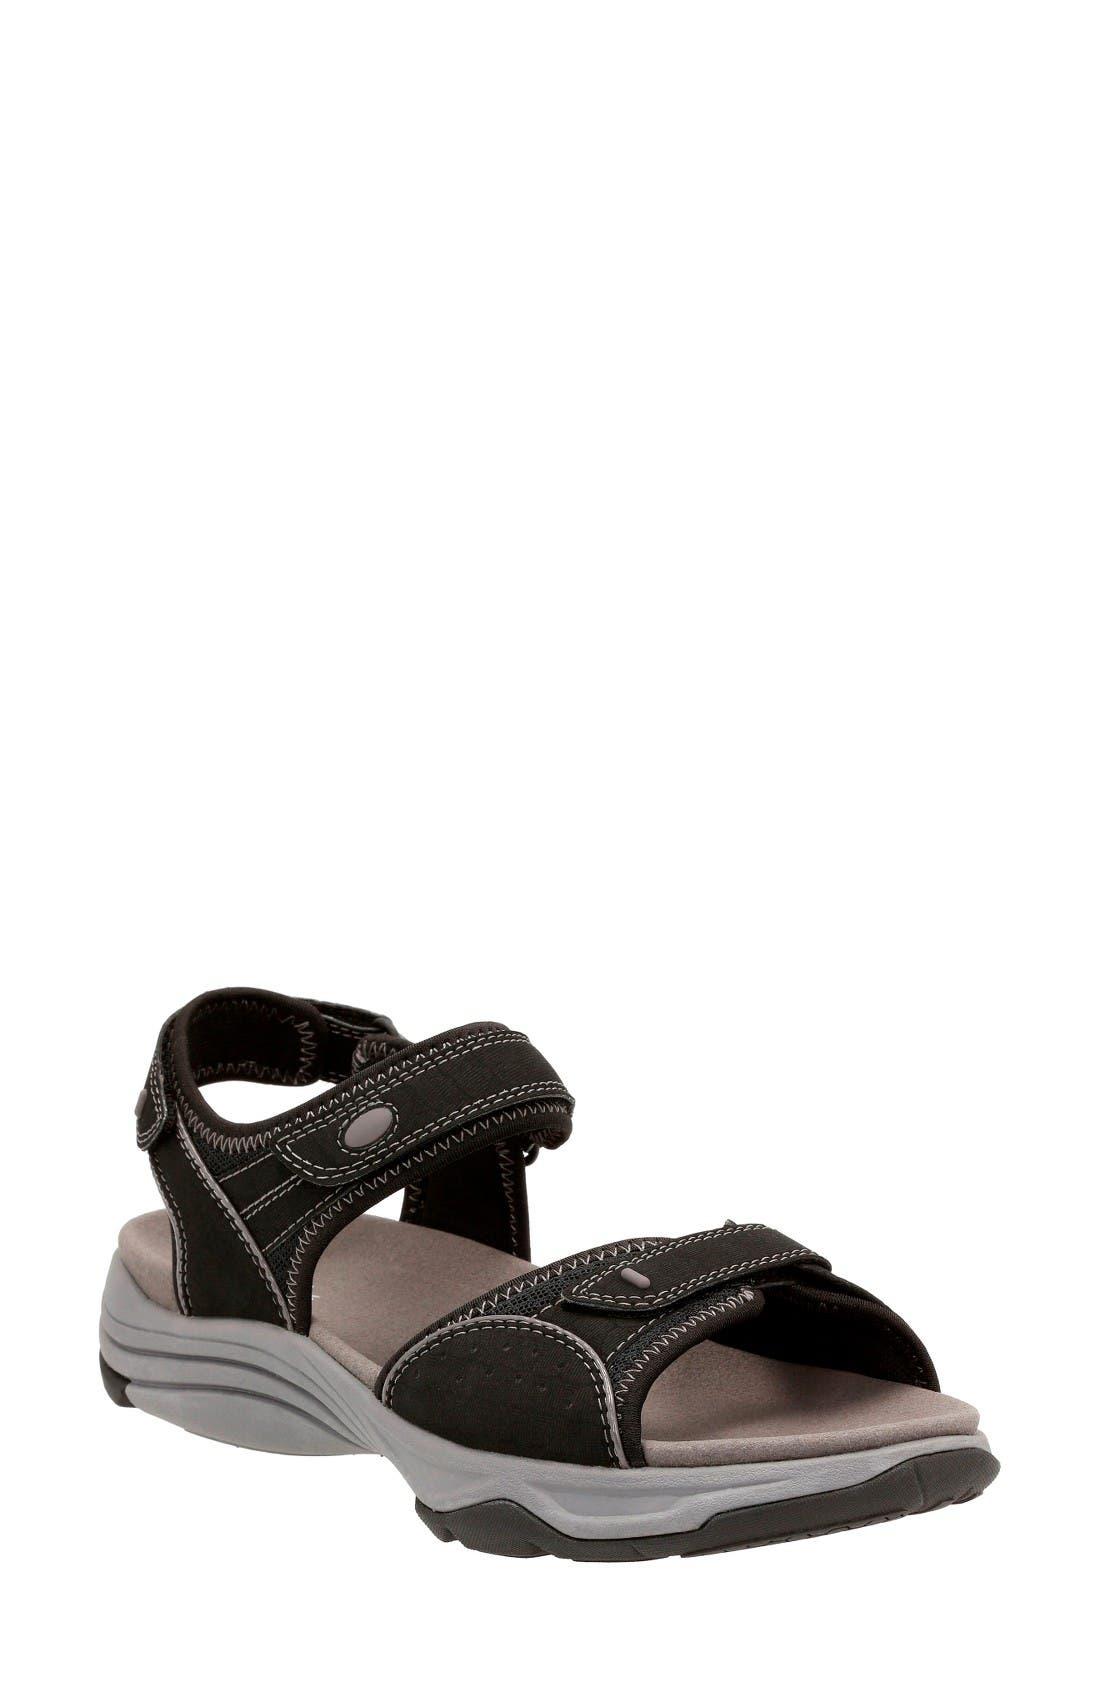 Alternate Image 1 Selected - Clarks® Wave Grip Sandal (Women)